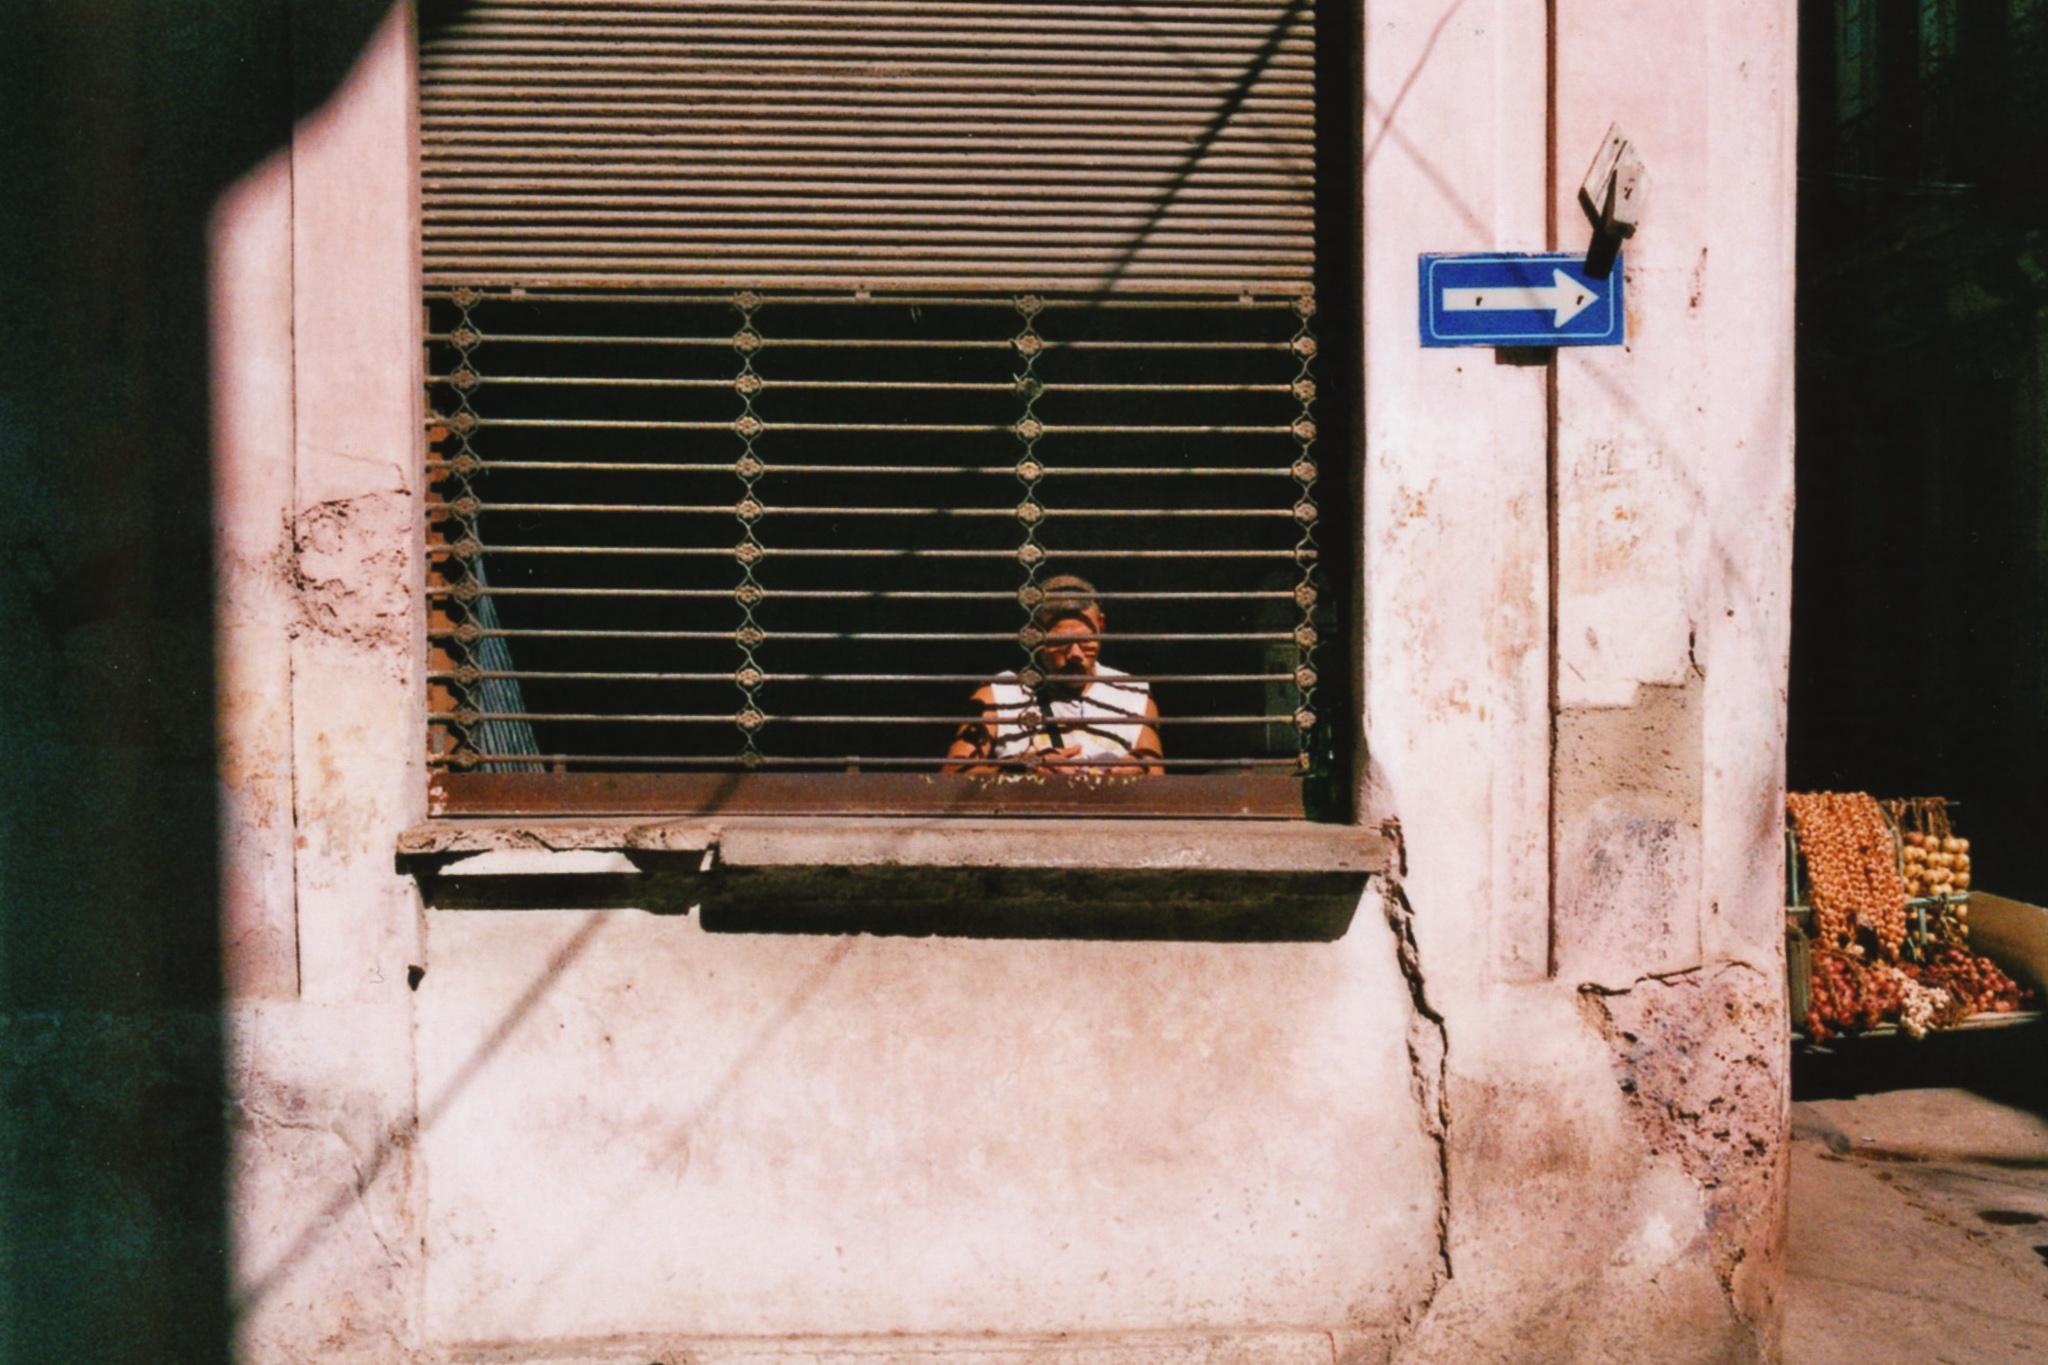 Kuba-2017-12-Analog-039.jpg